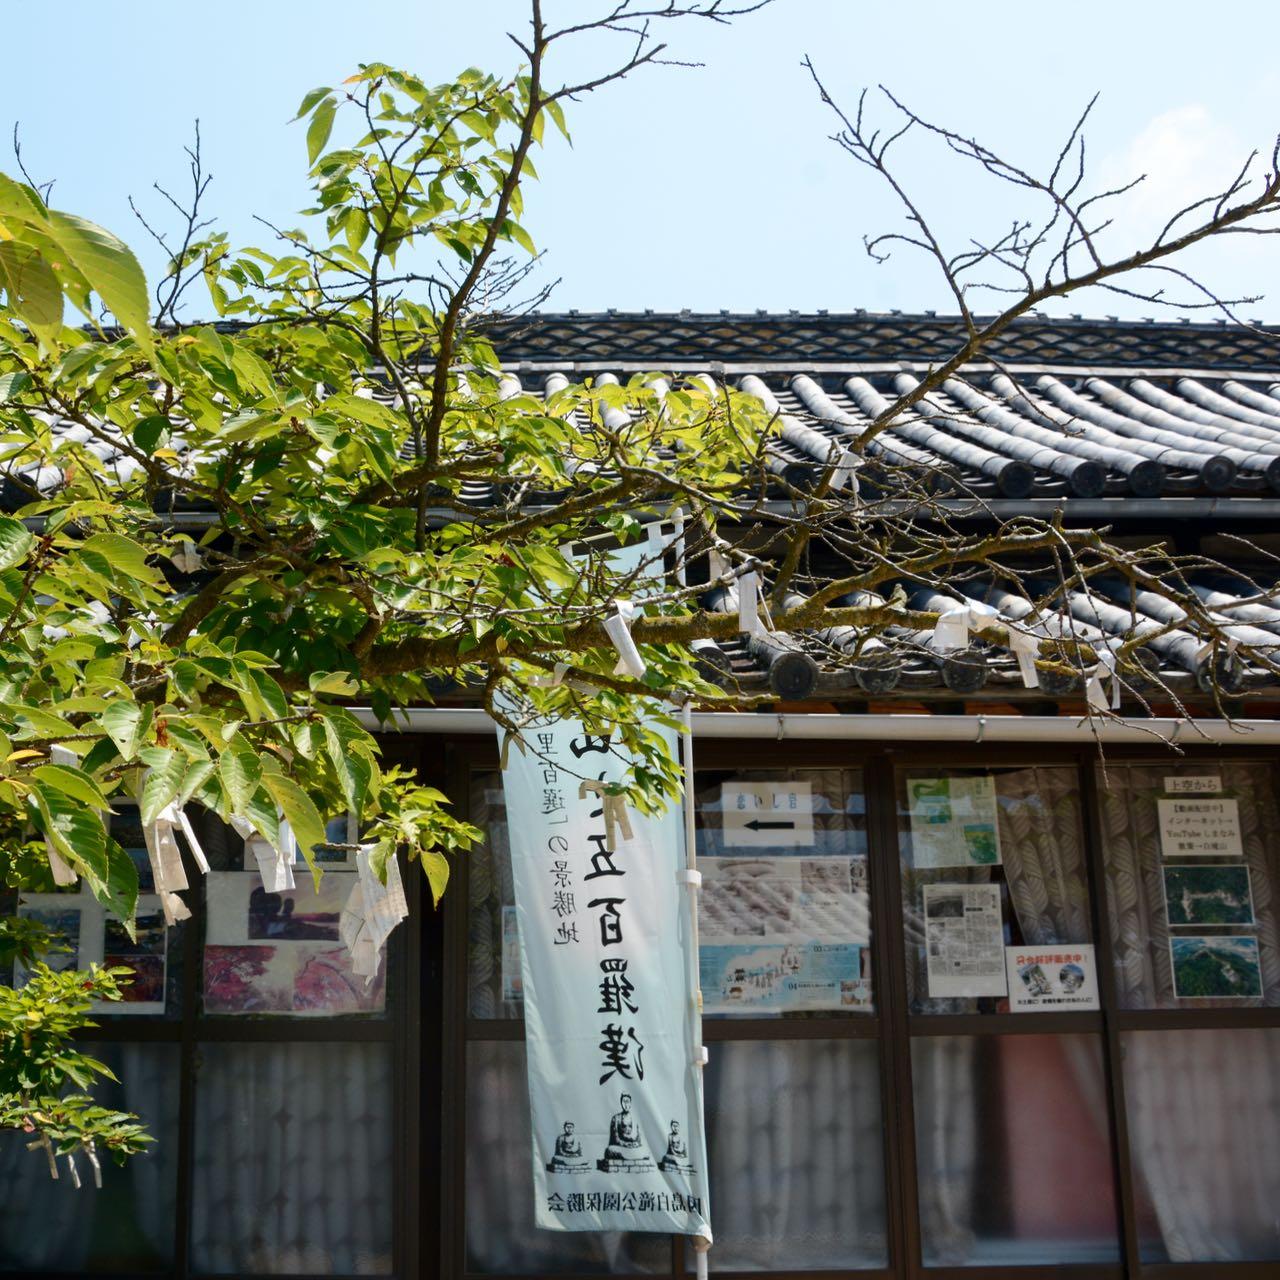 innoshima shiarataki shrine office